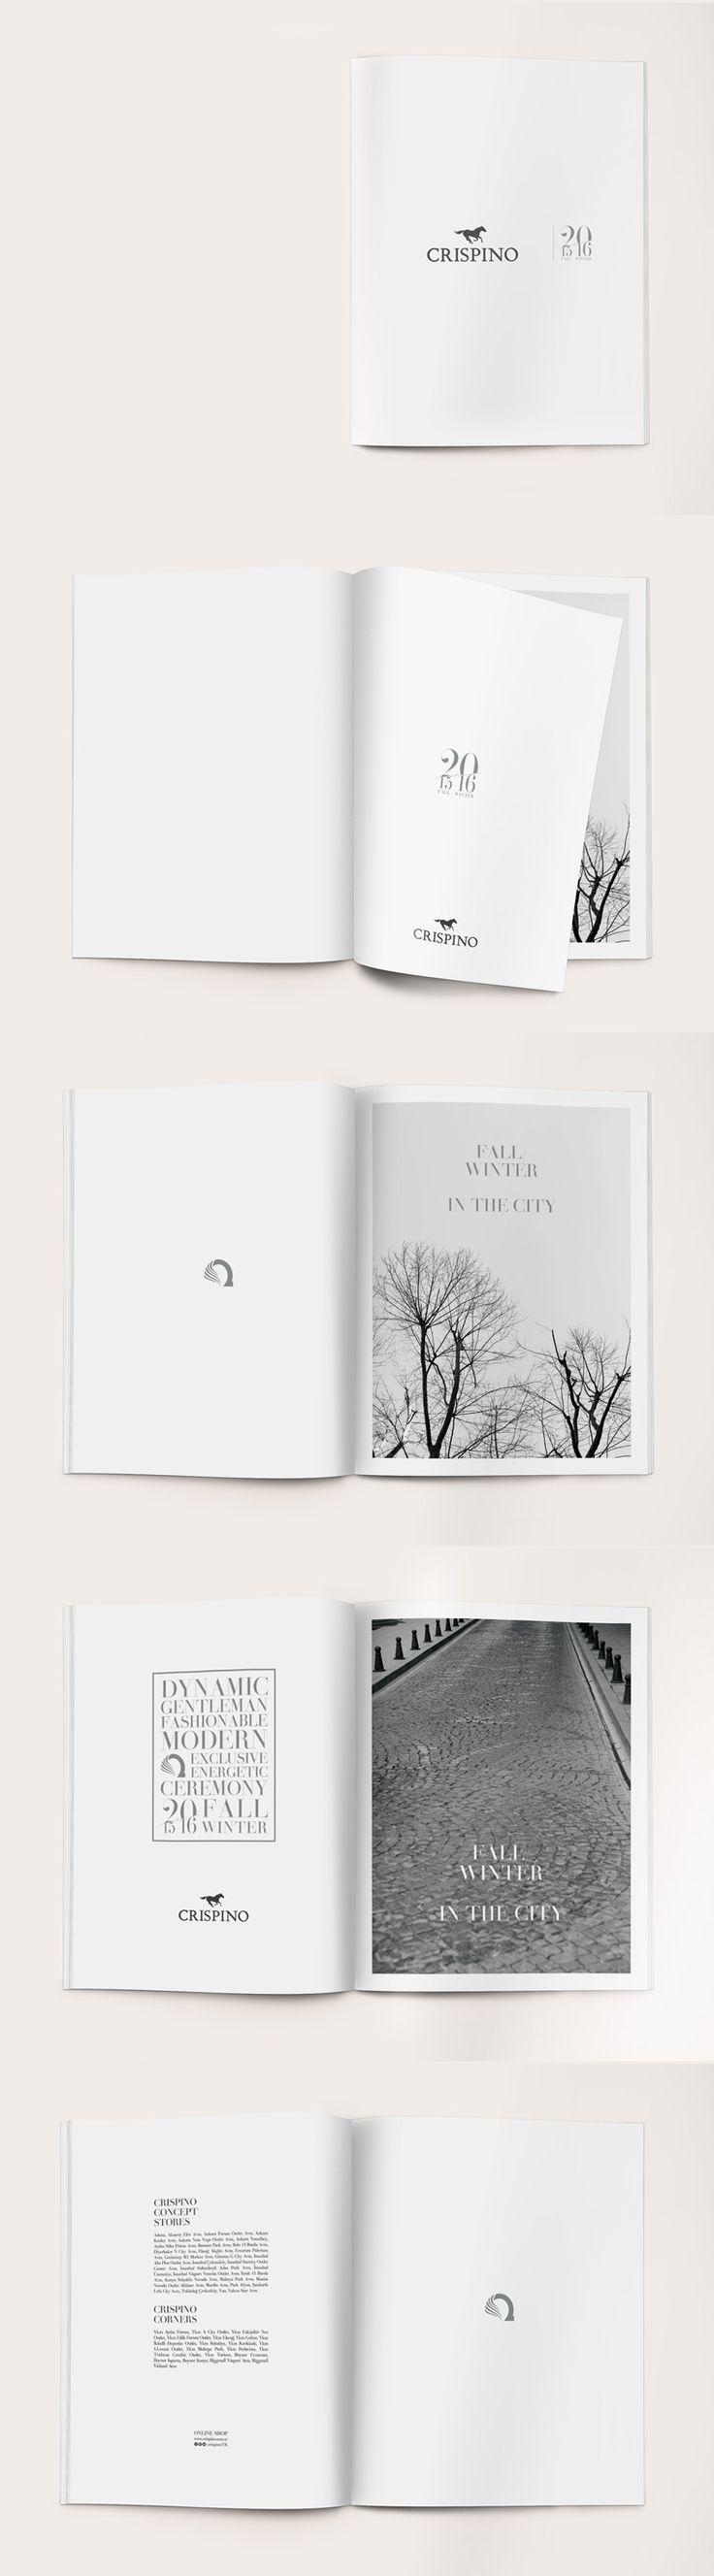 2015-2016 Fall Winter / Crispino Catalogue